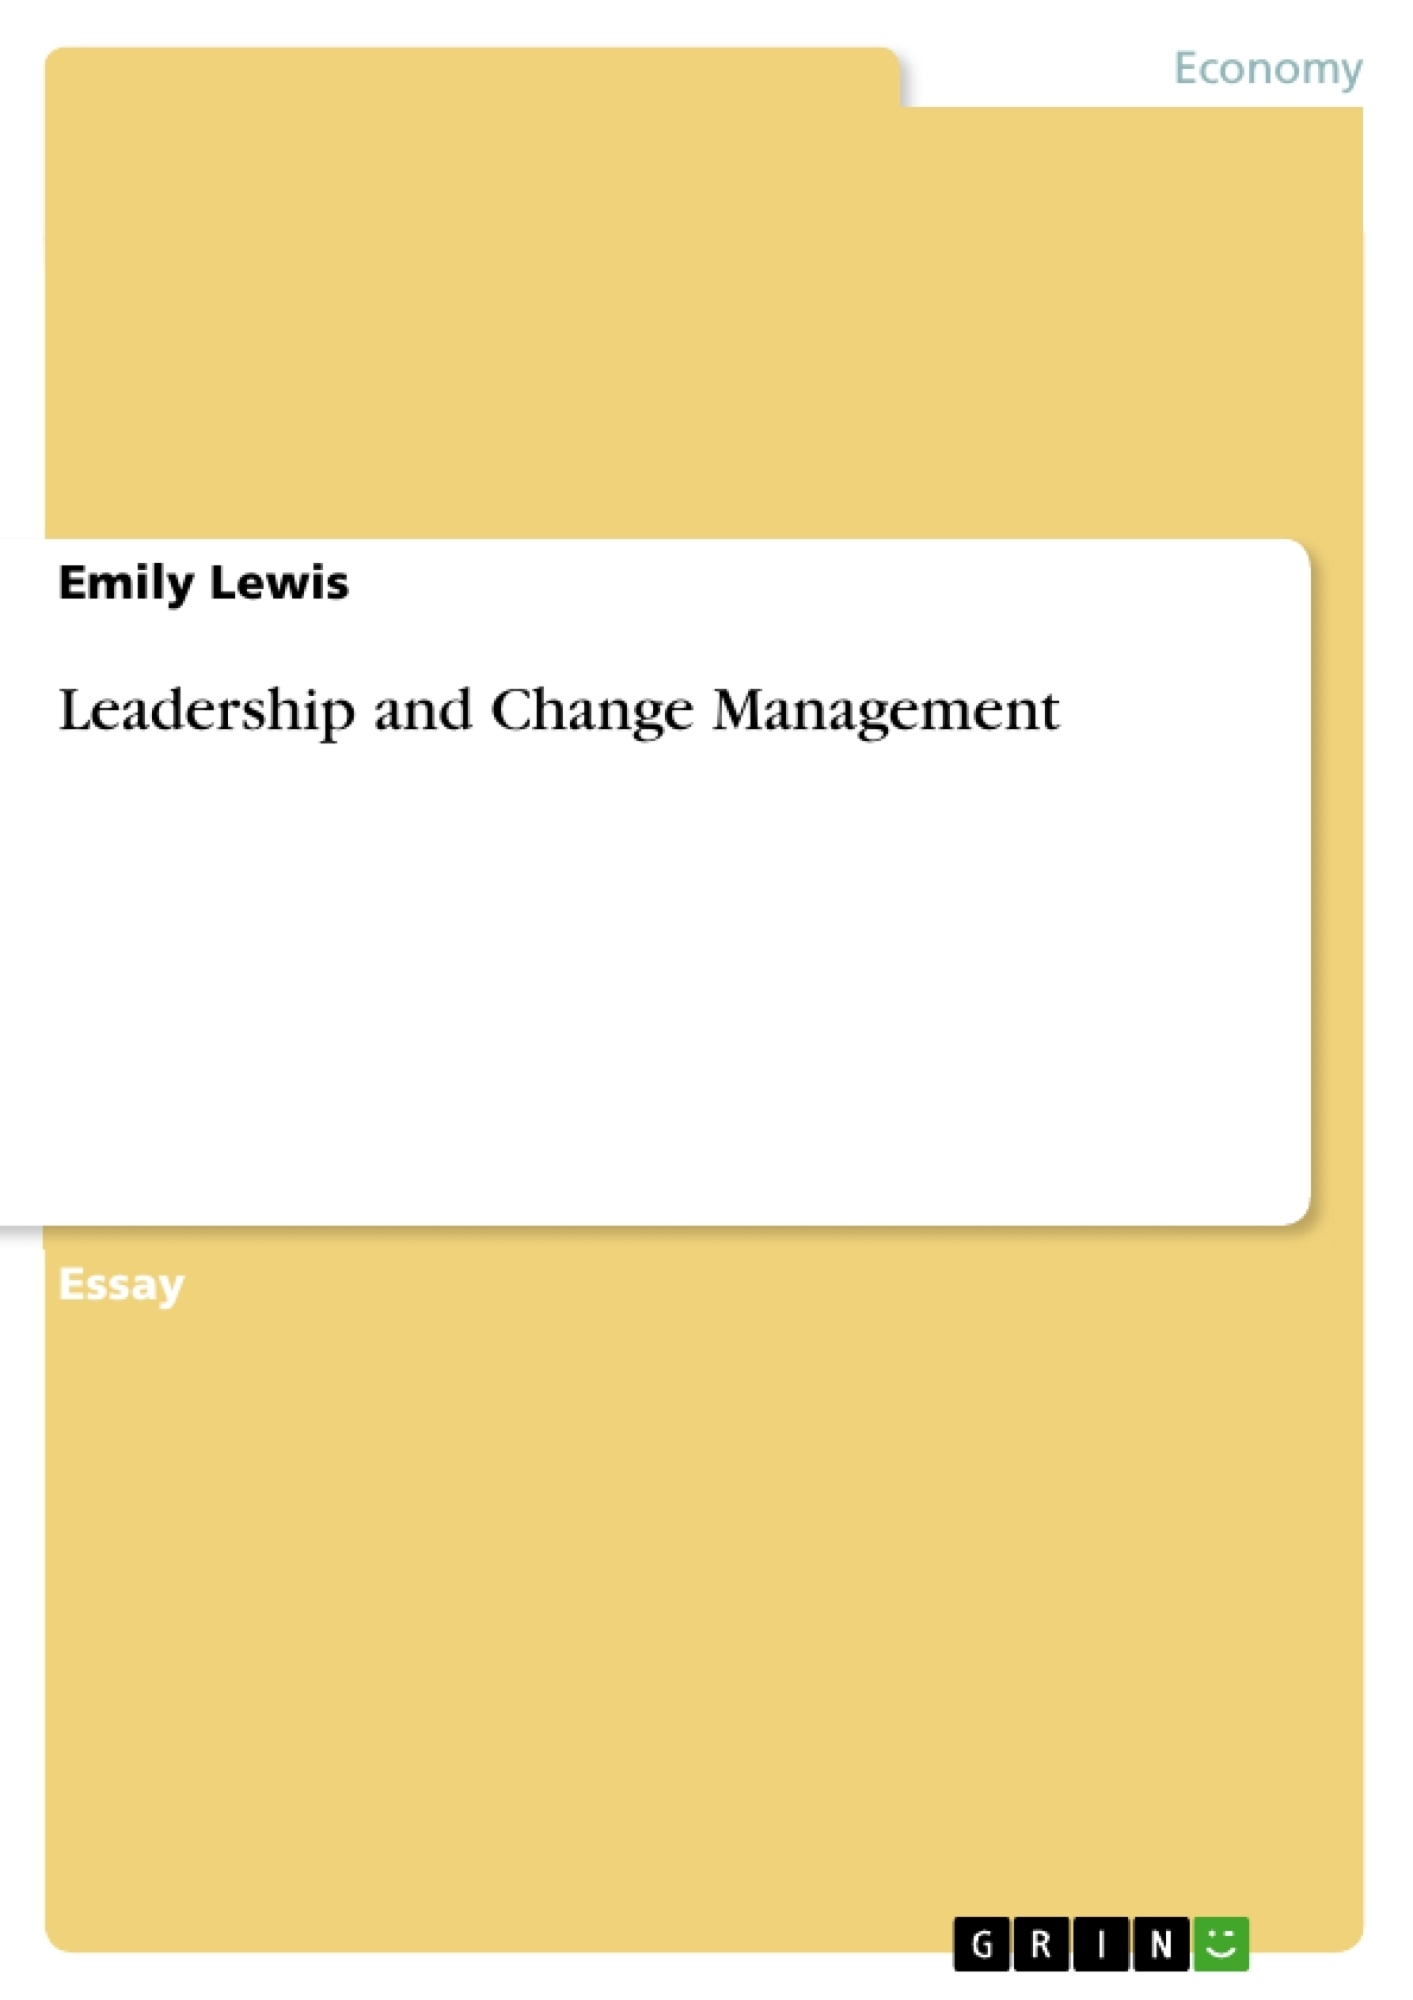 kurt lewin organizational change essays Kurt lewin's change theory theories concerning organizational change were dominated by lewin's planned change approach kurt-lewin theory of change.